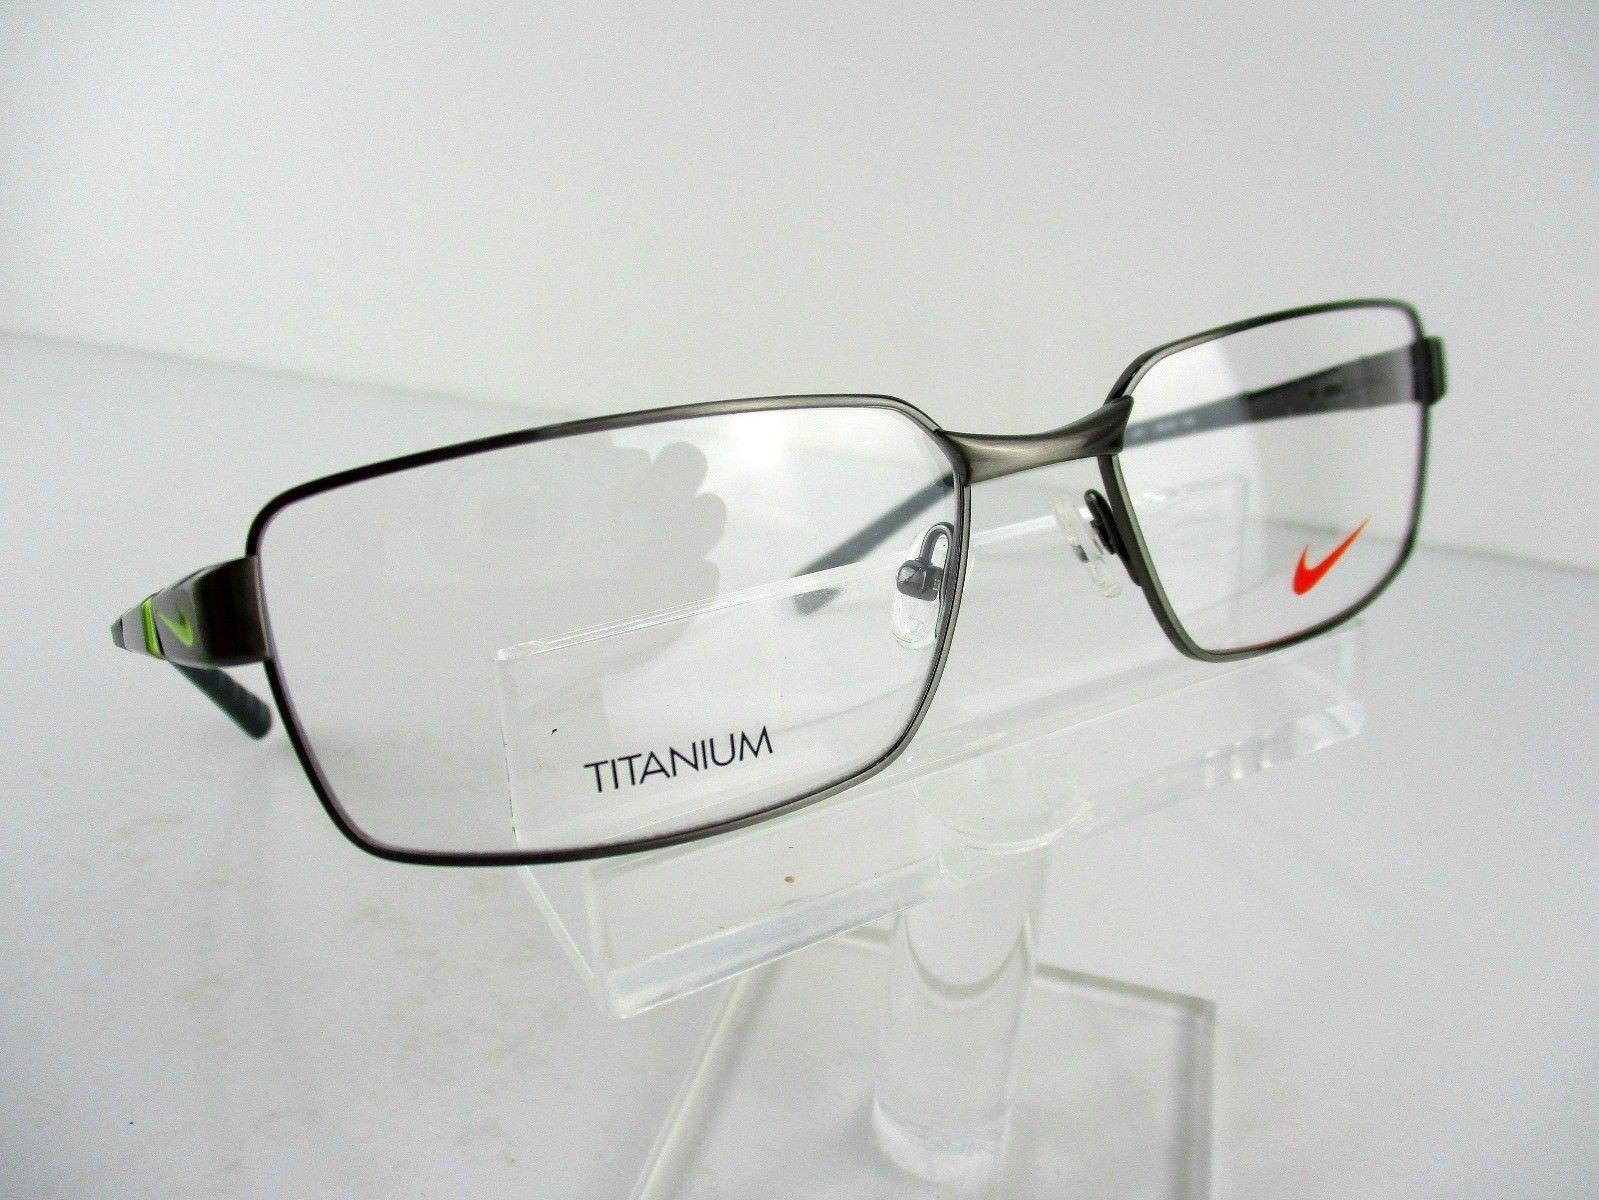 751cd5b20839 Nike TITANIUM 6058 (069) Brushed Gunmetal 56 and 50 similar items